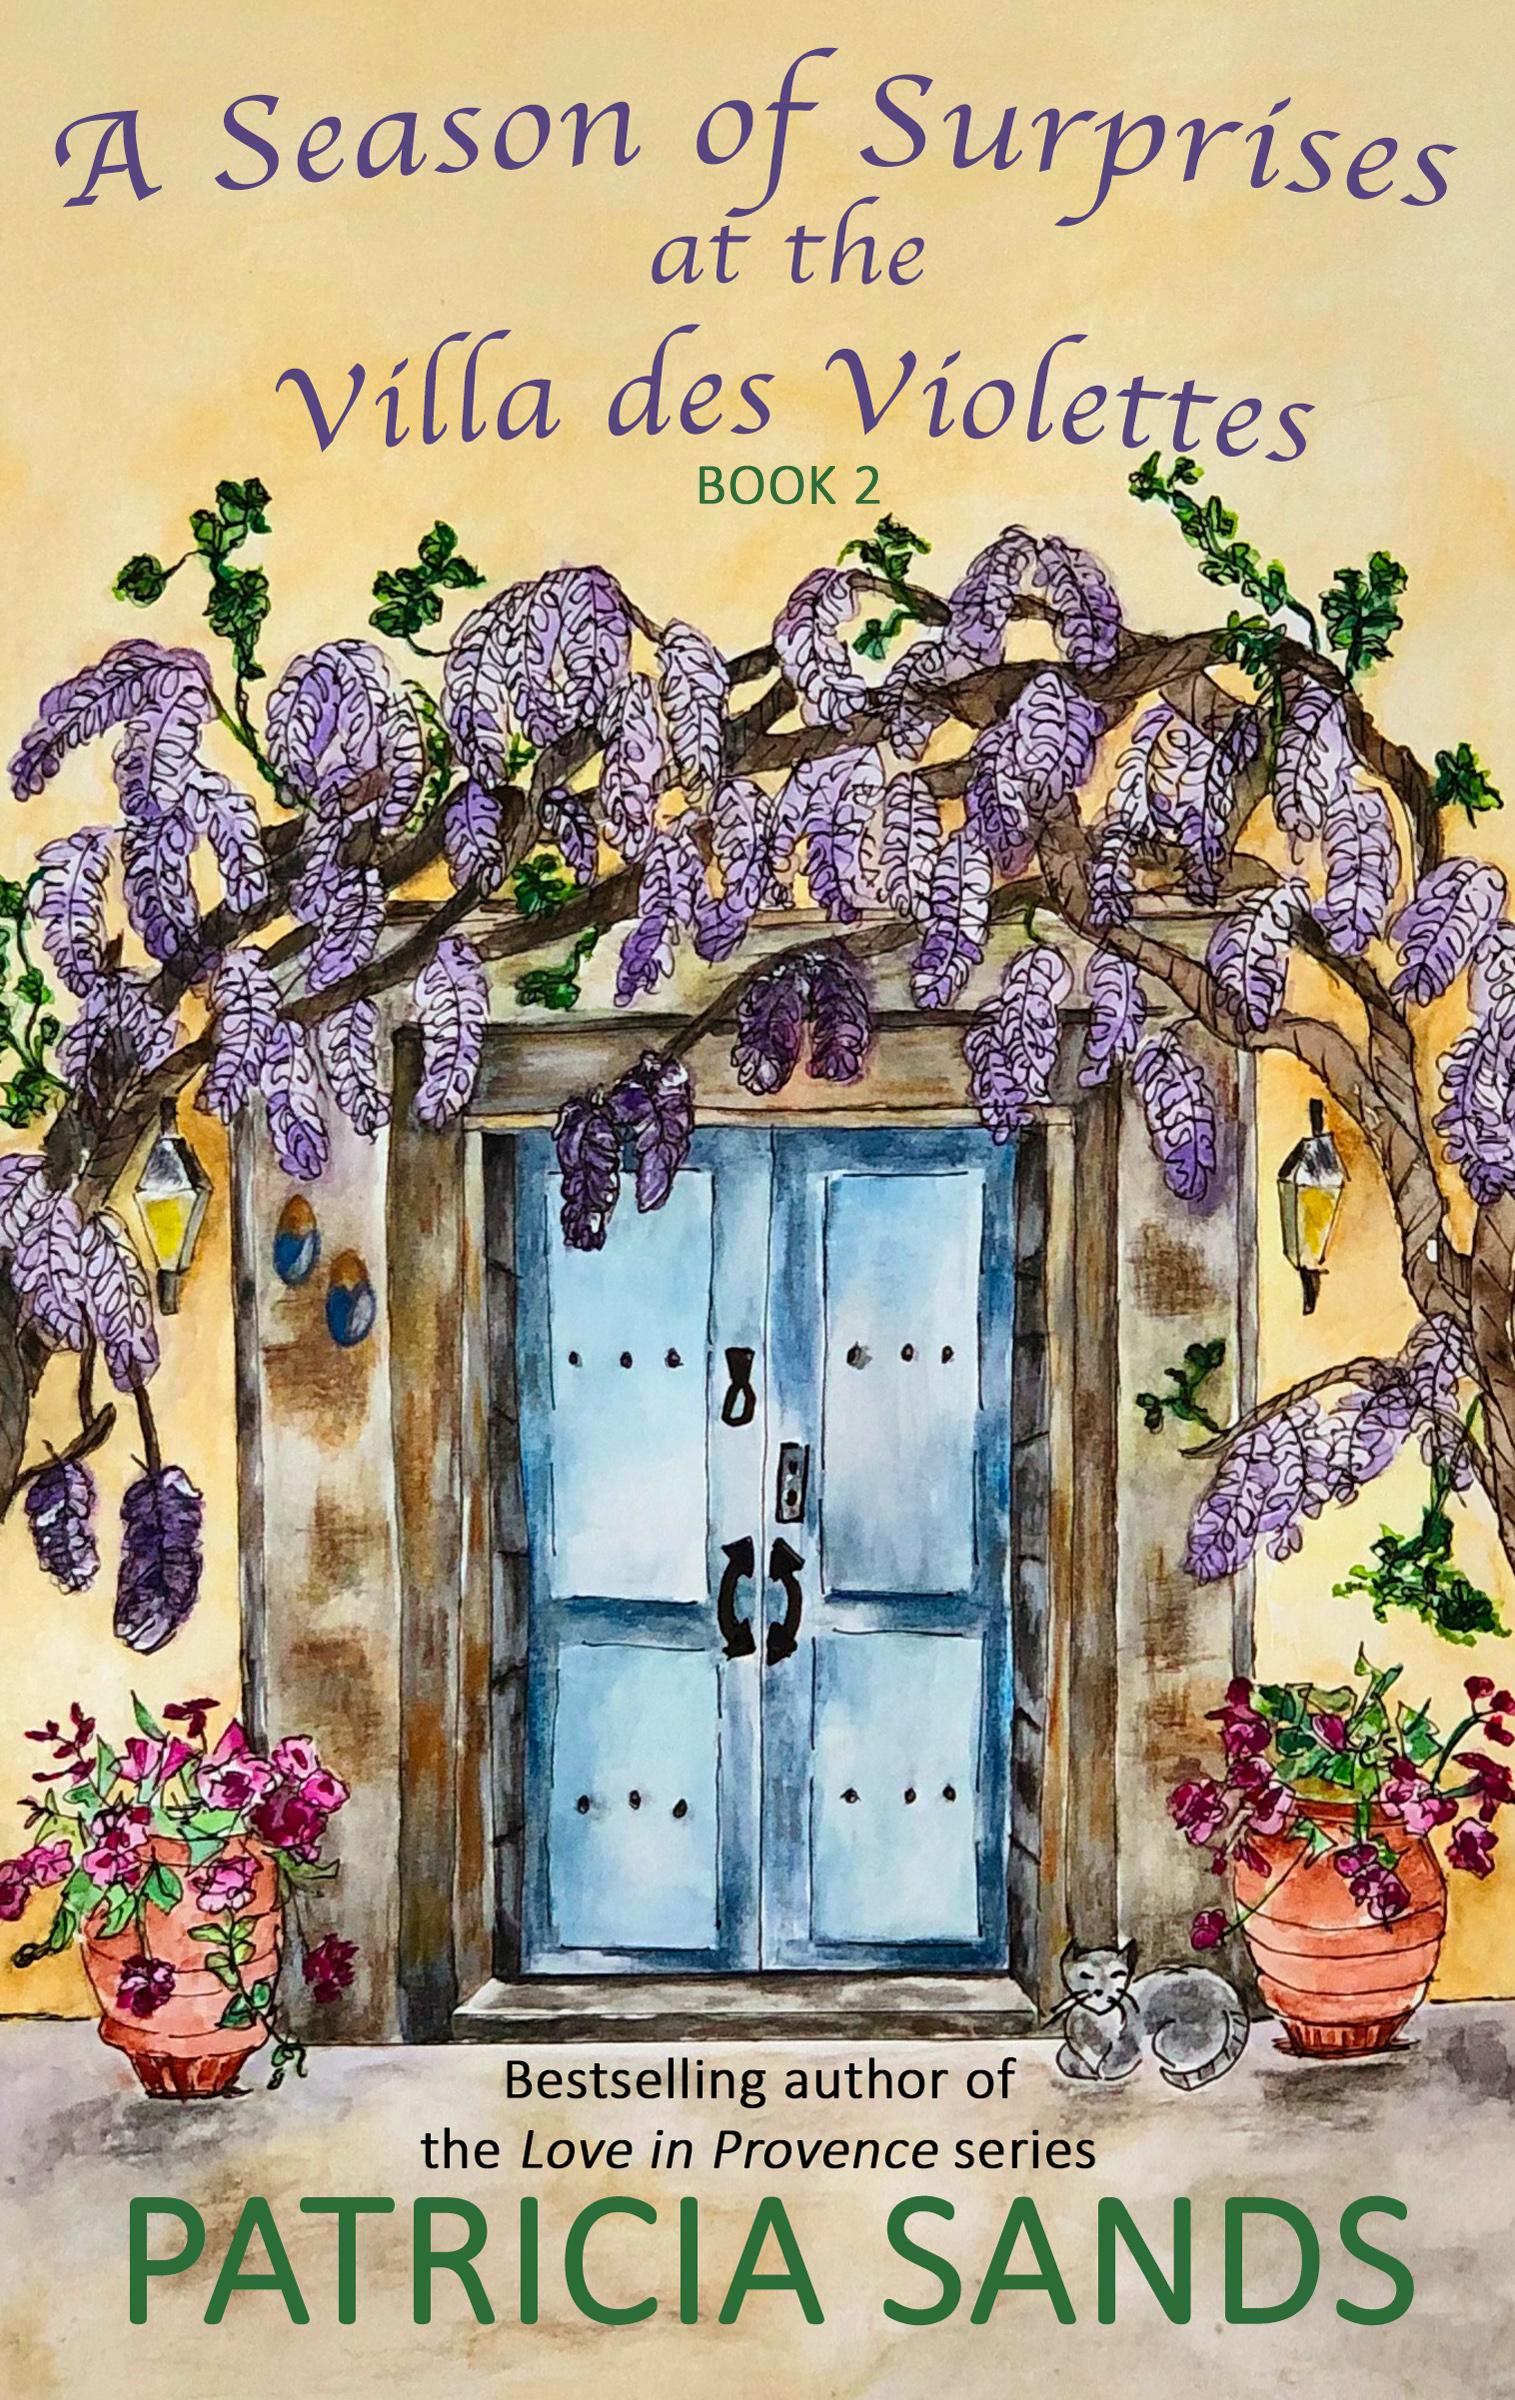 Violettes Kindle